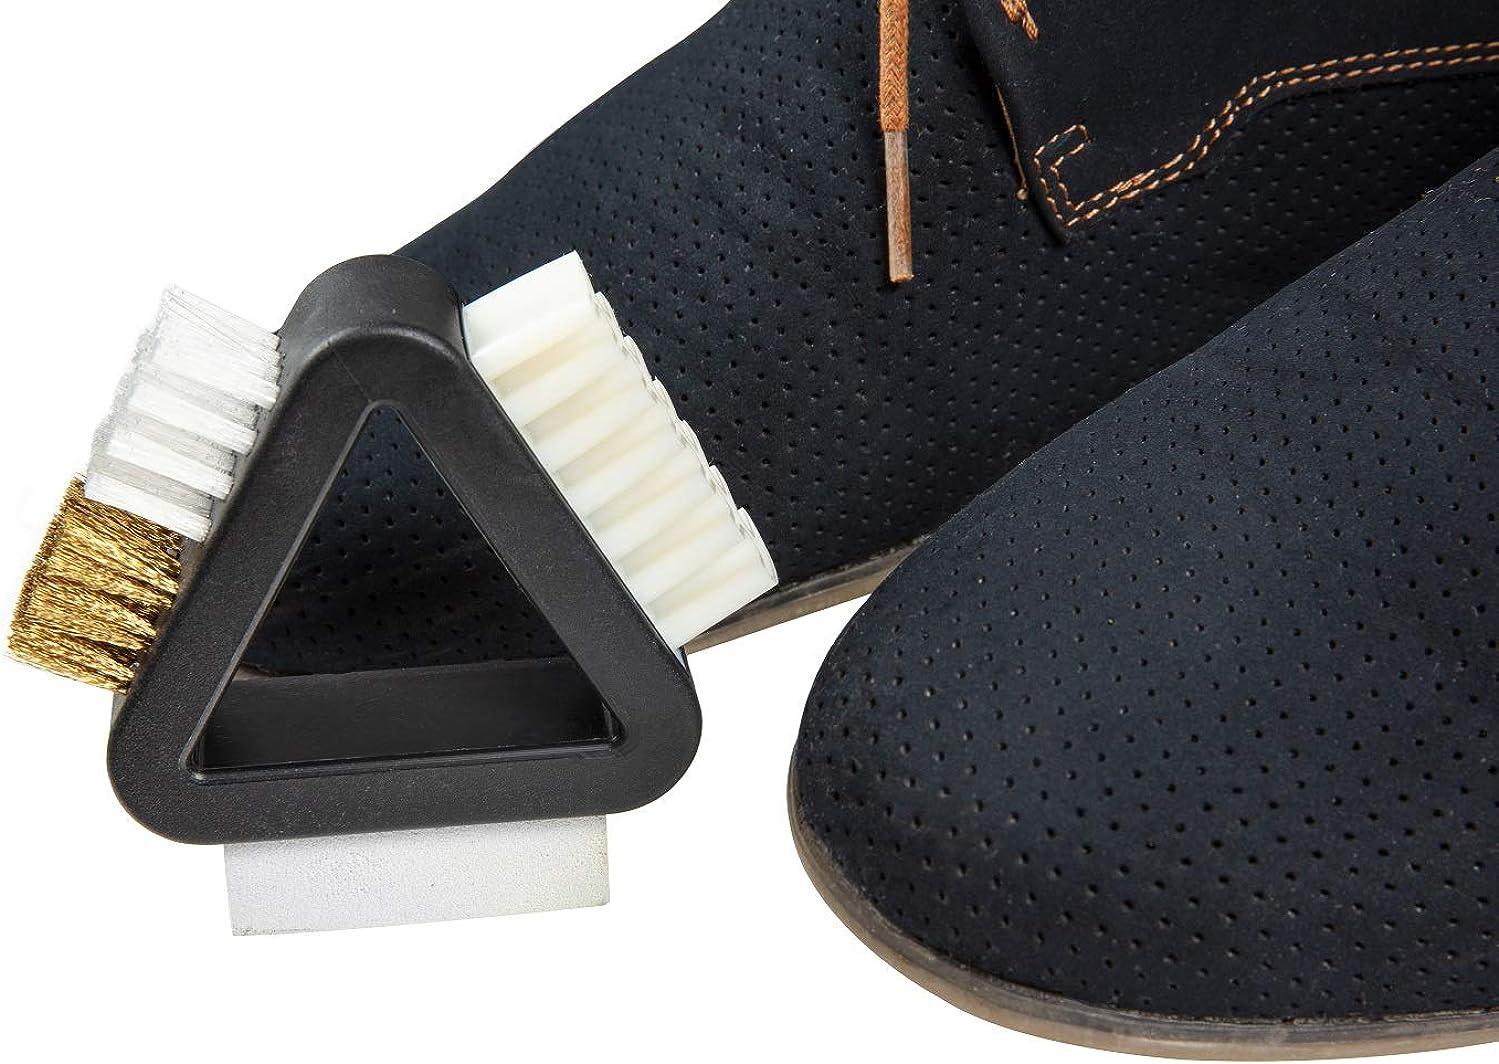 Kaps Kit 3 en 1 Brosse Multifonction pour Nettoyer Chaussures et Sacs en Daim